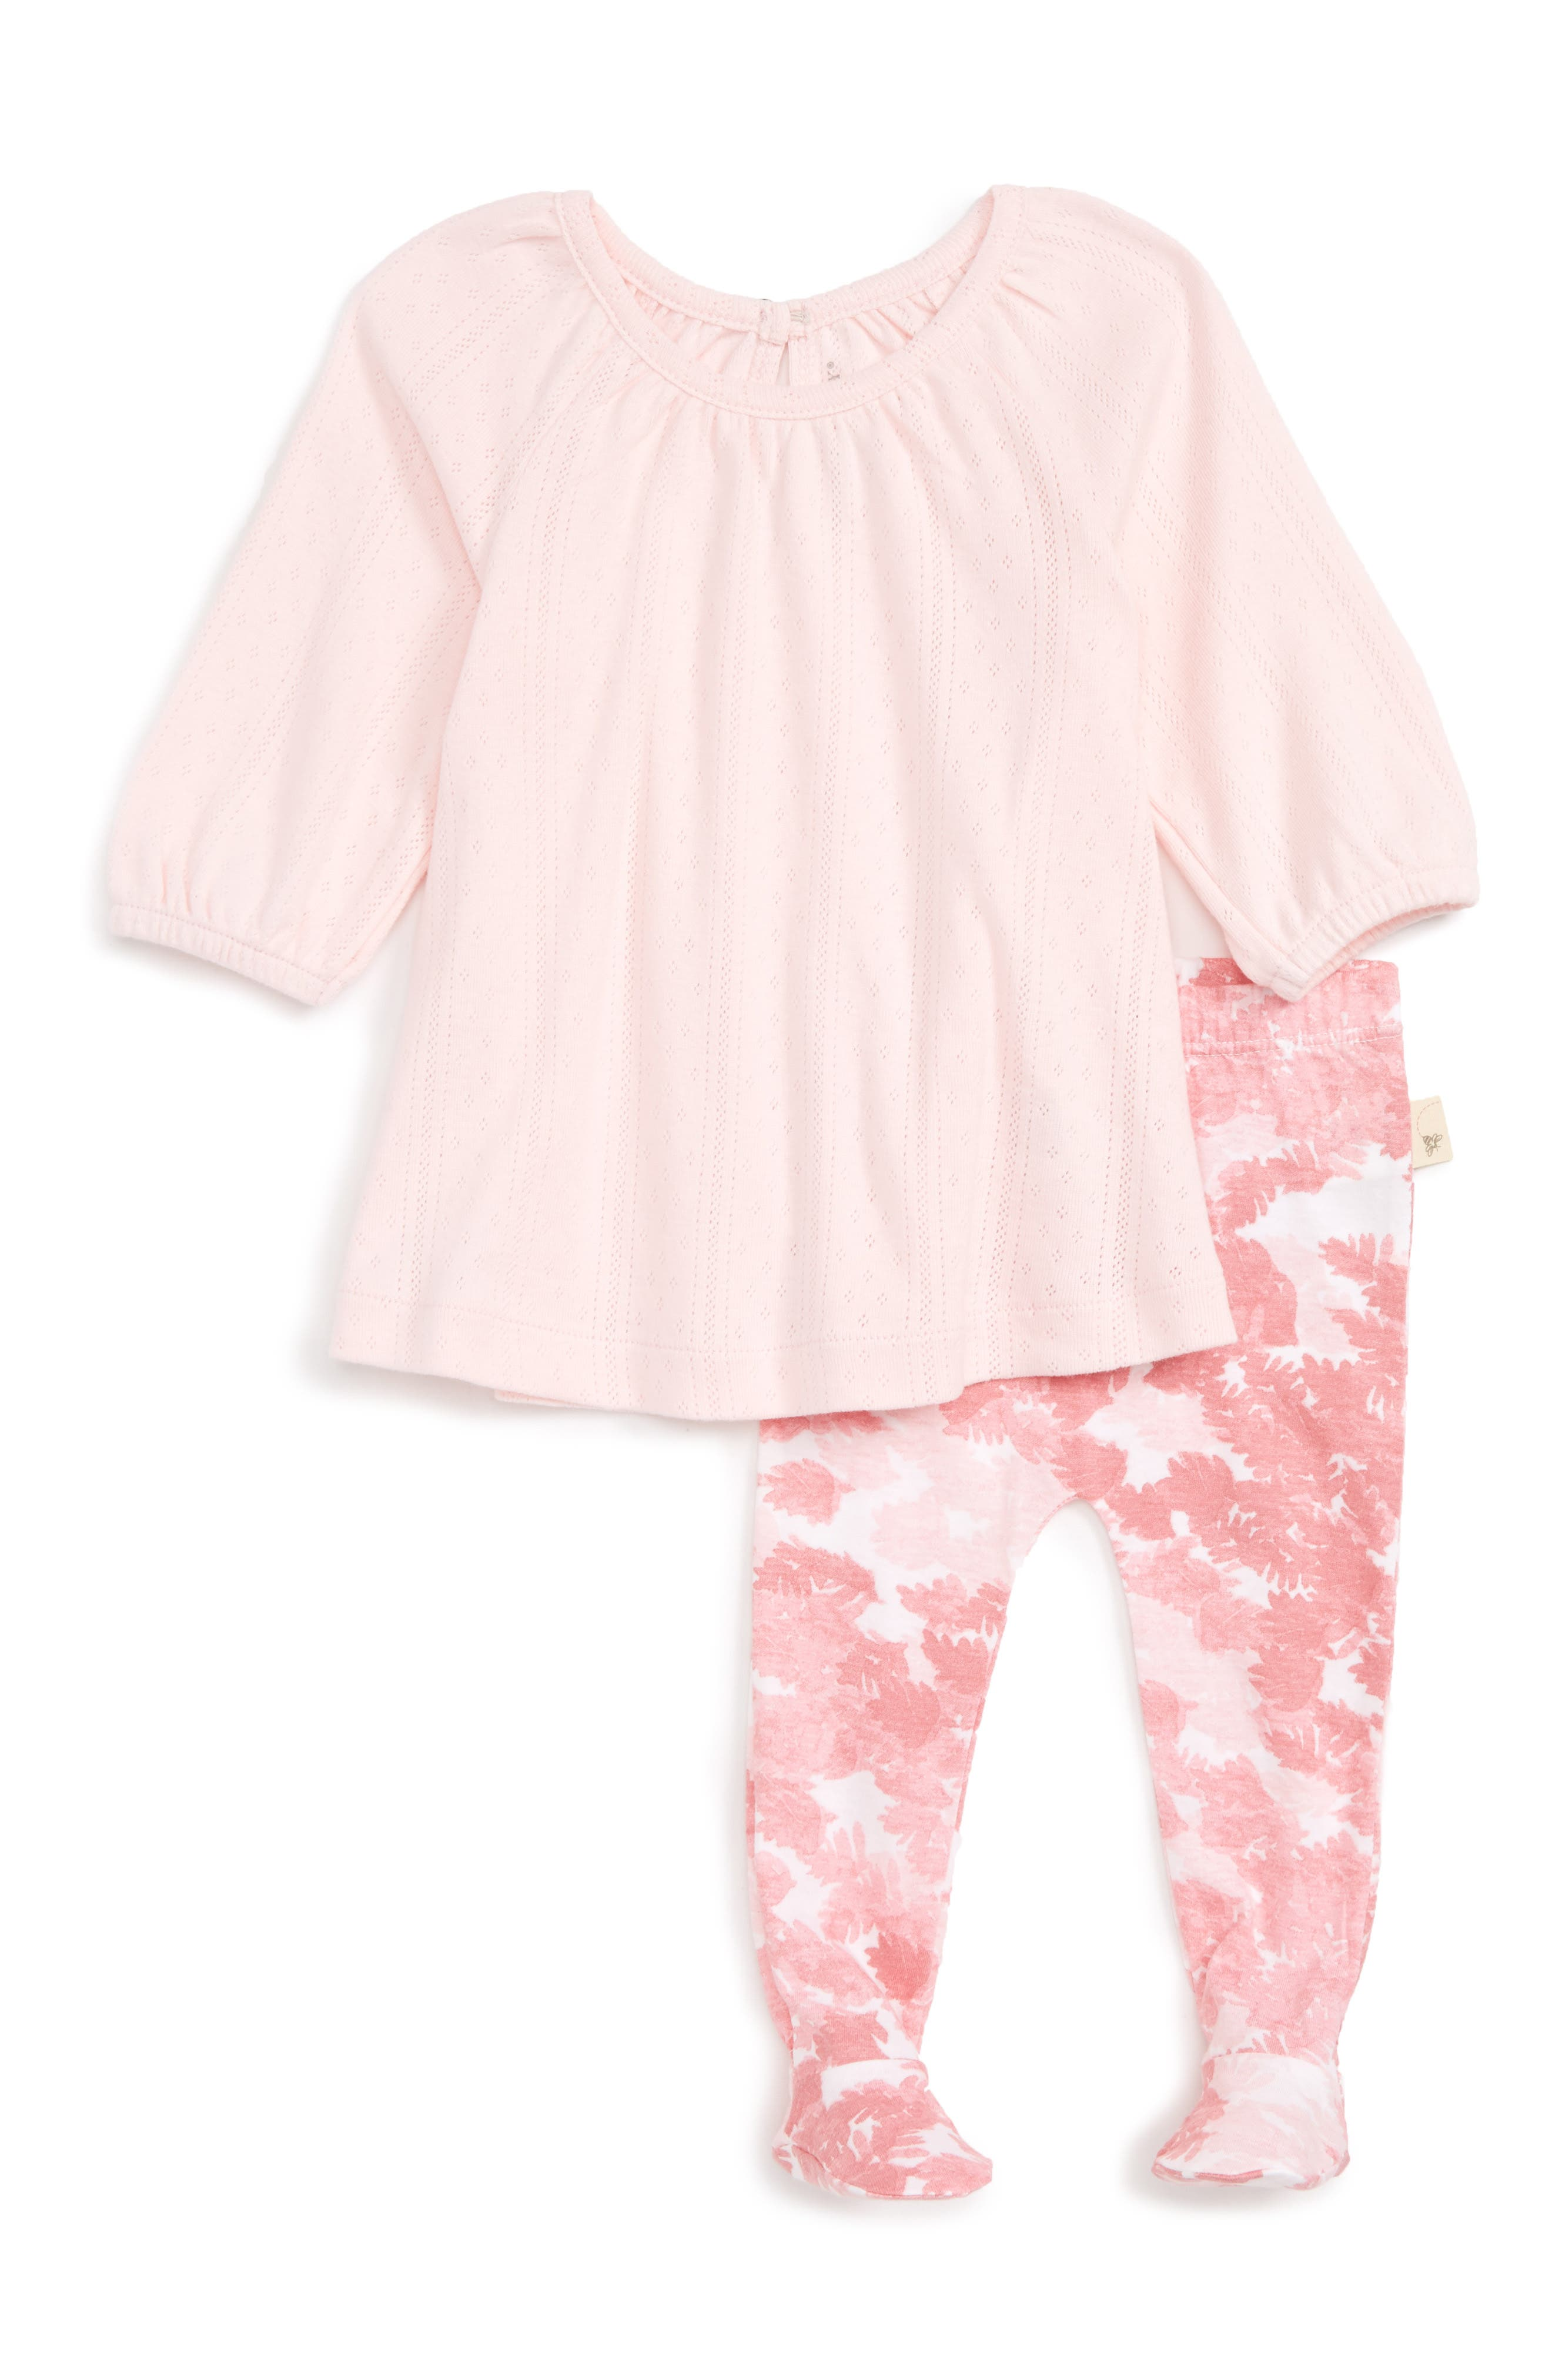 Burt's Bees Baby Pointelle Organic Cotton Dress & Footed Leggings Set (Baby Girls)